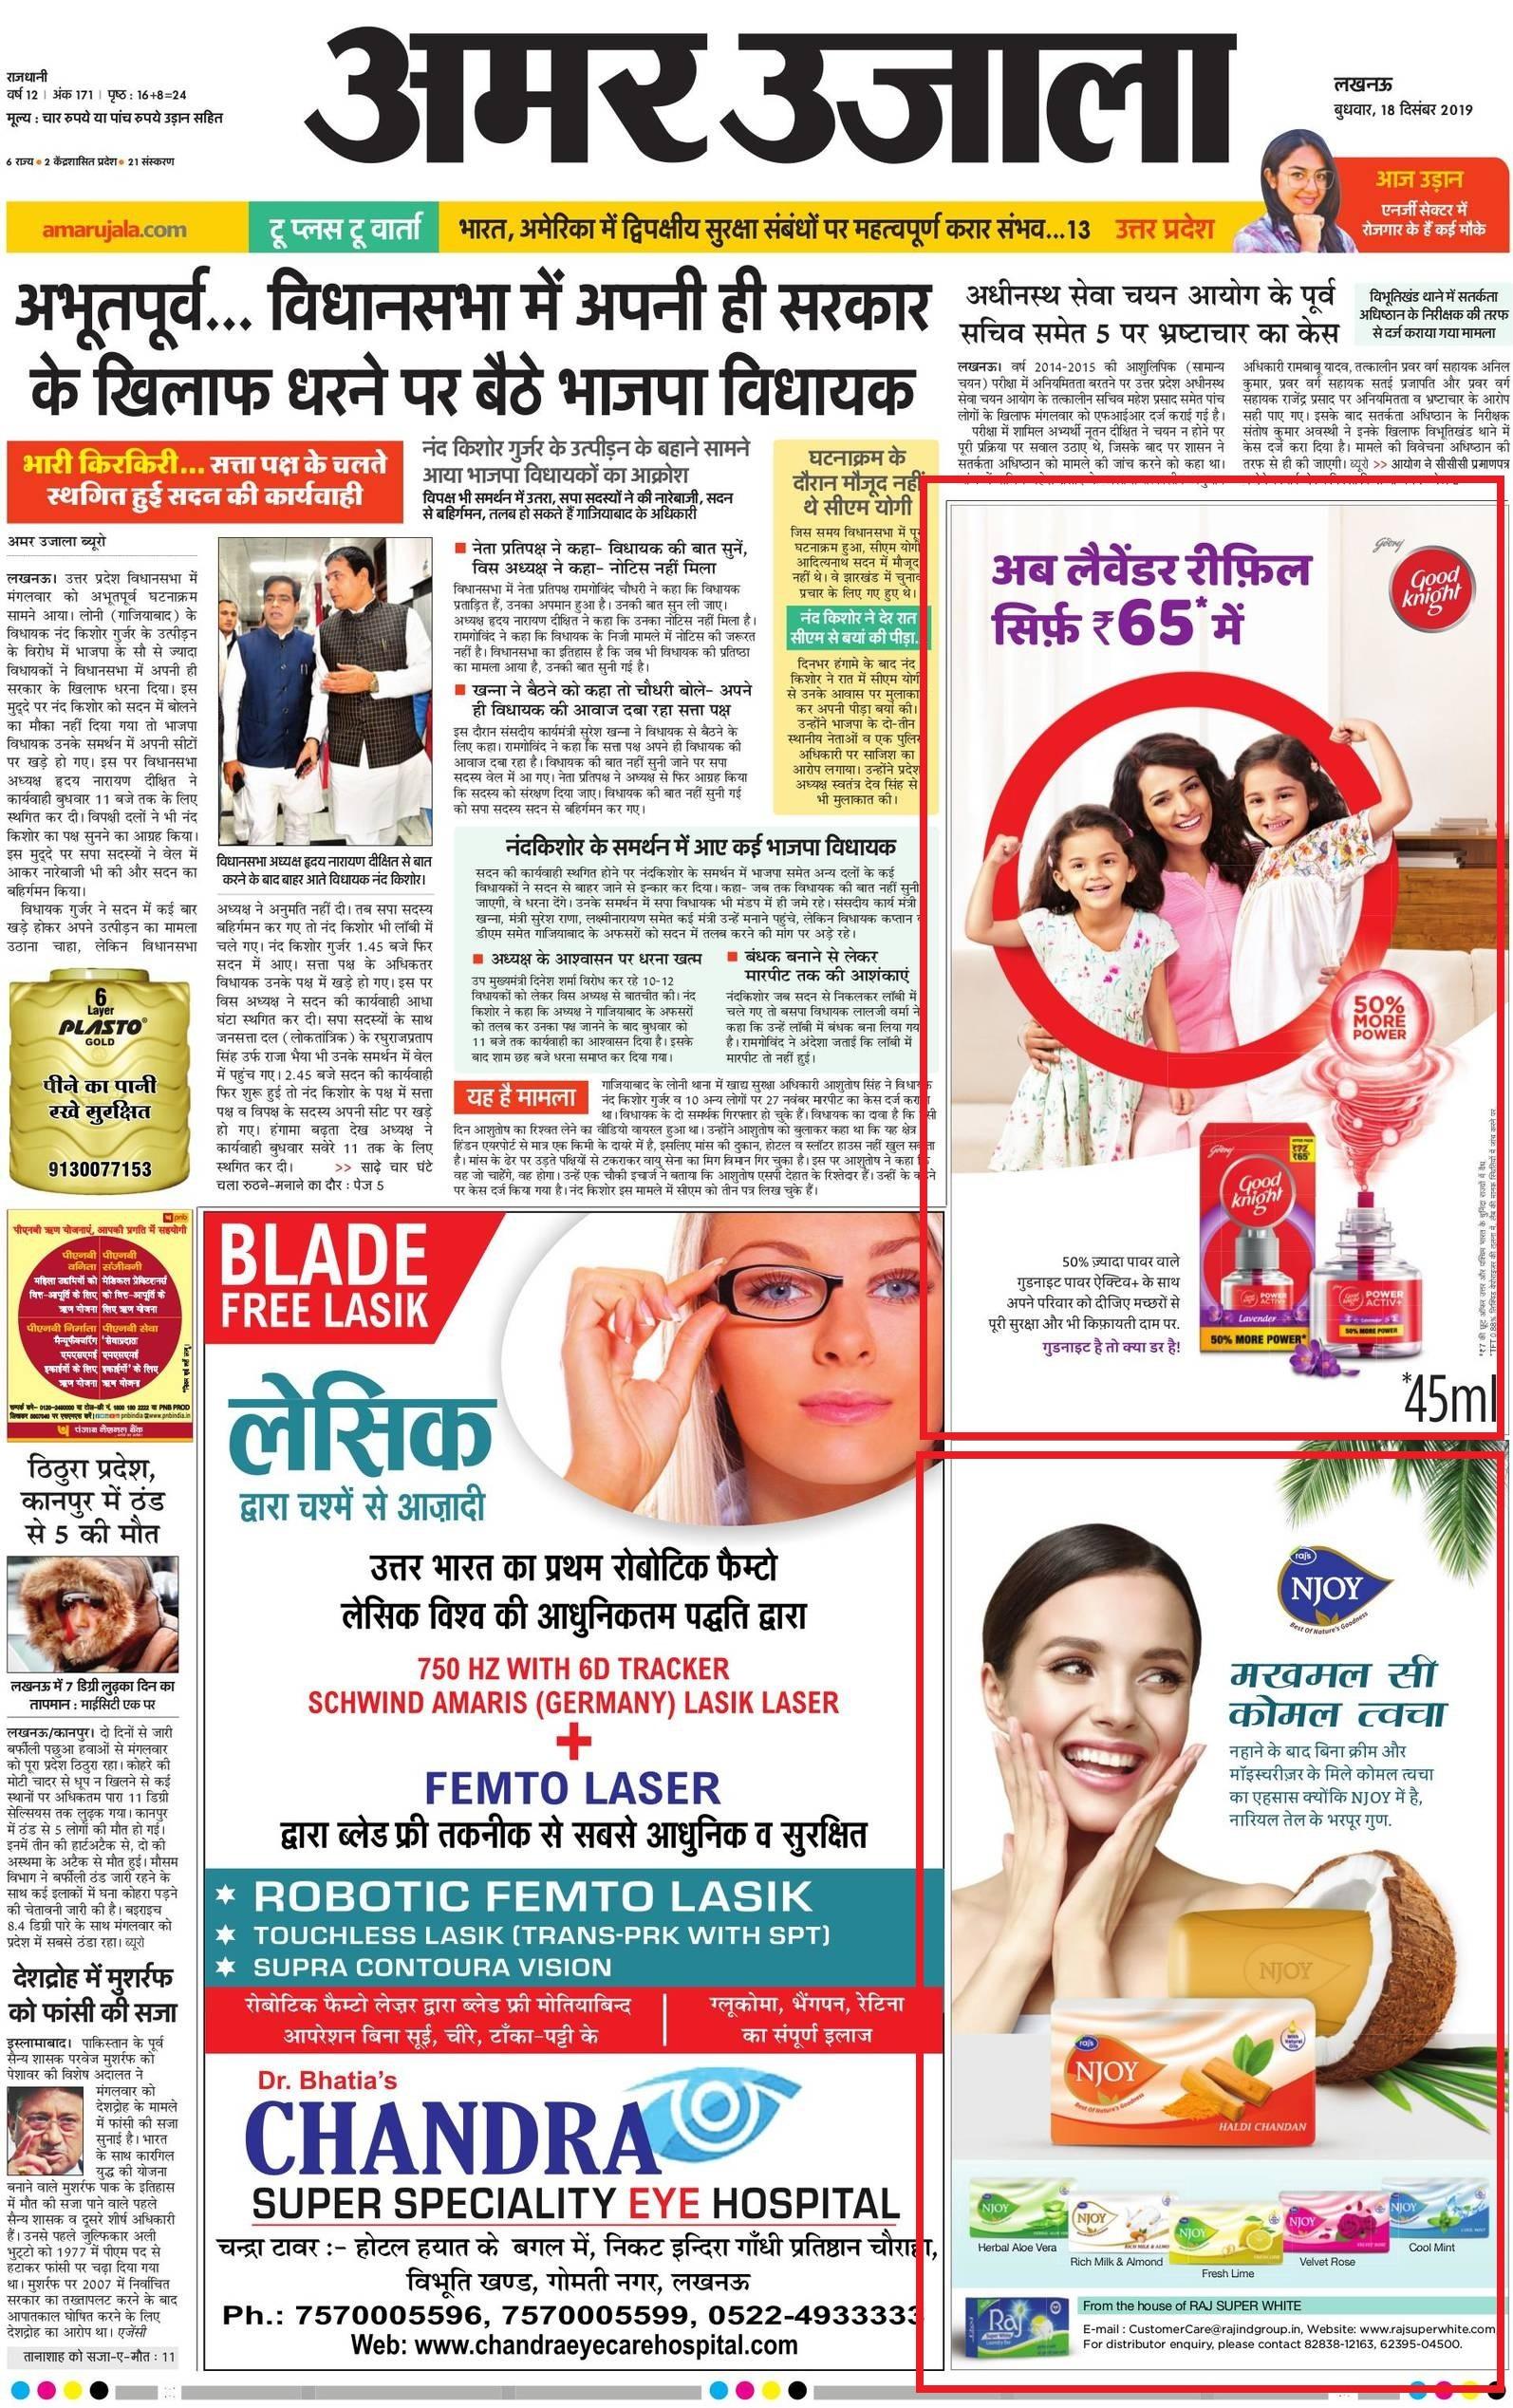 Navbharat Times, Delhi, Hindi Newspaper - Custom Sized Advertising